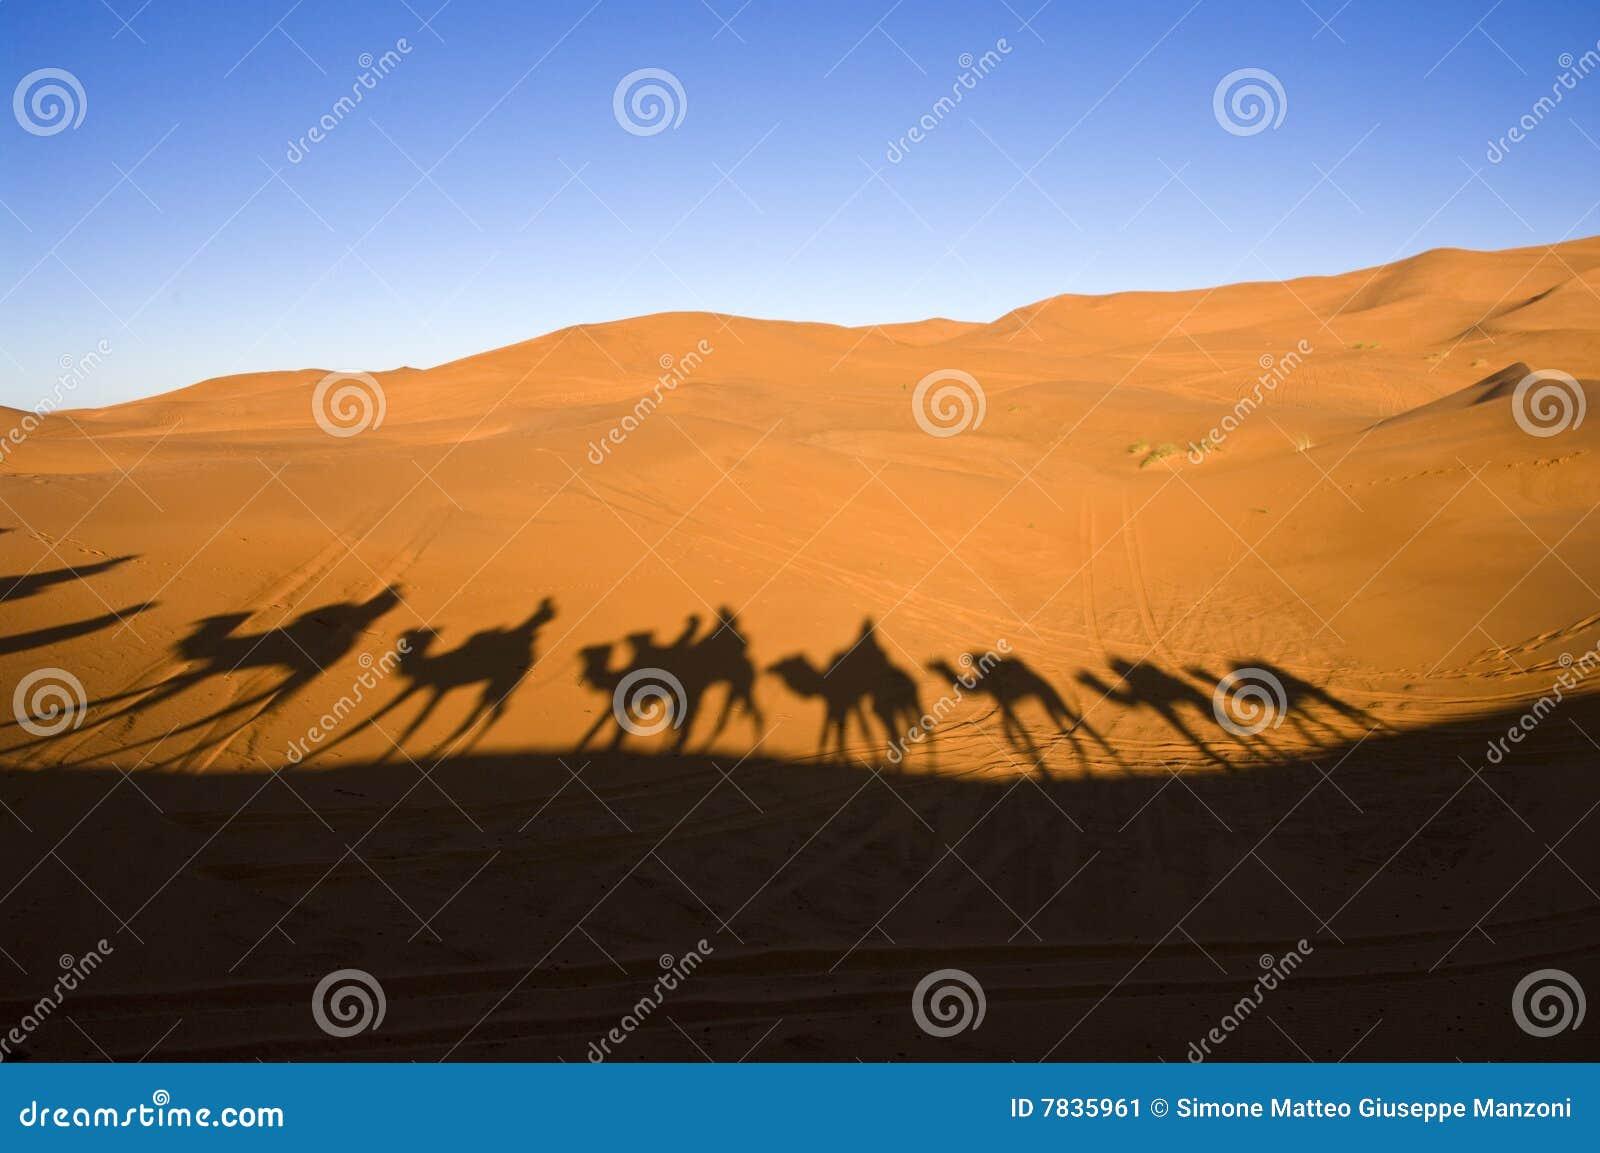 Caravan in the Sahara desert